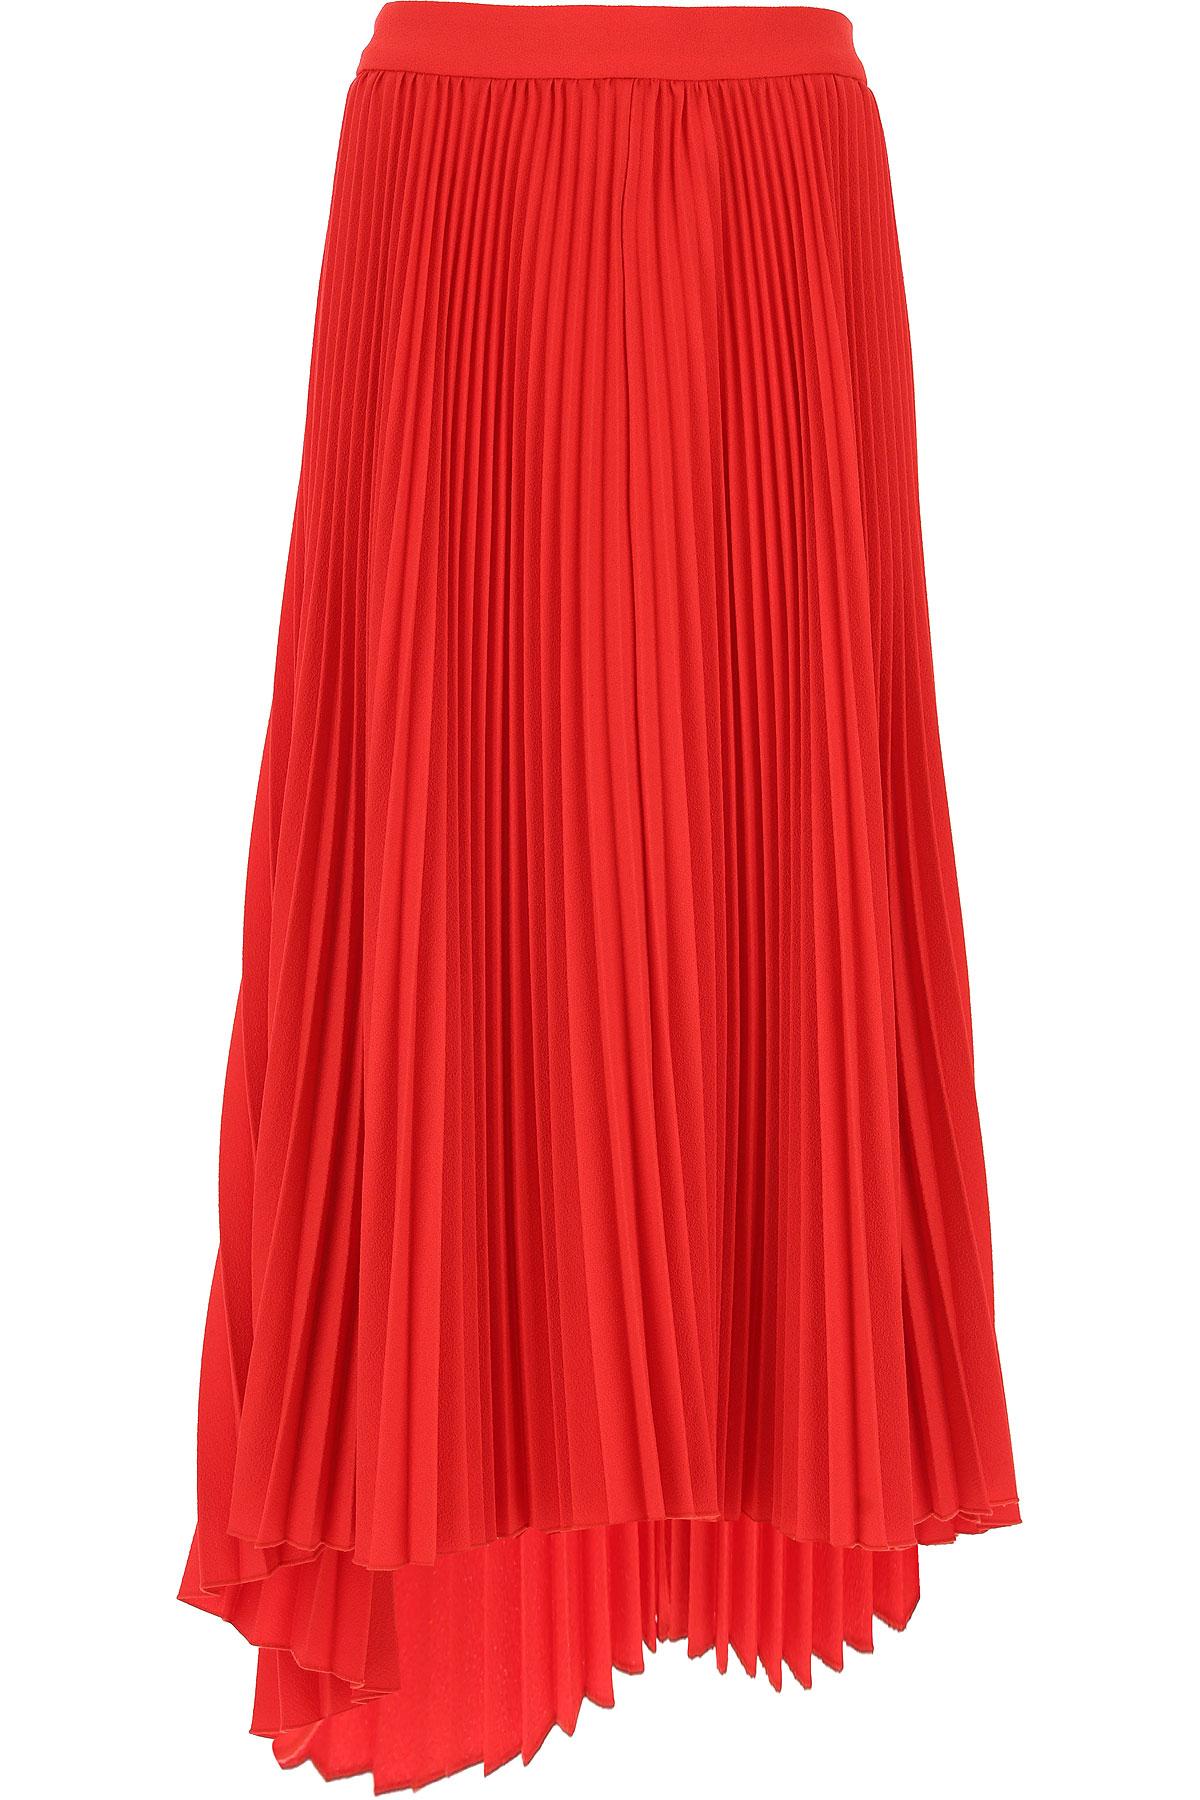 MSGM Skirt for Women, Red, polyester, 2017, 26 28 30